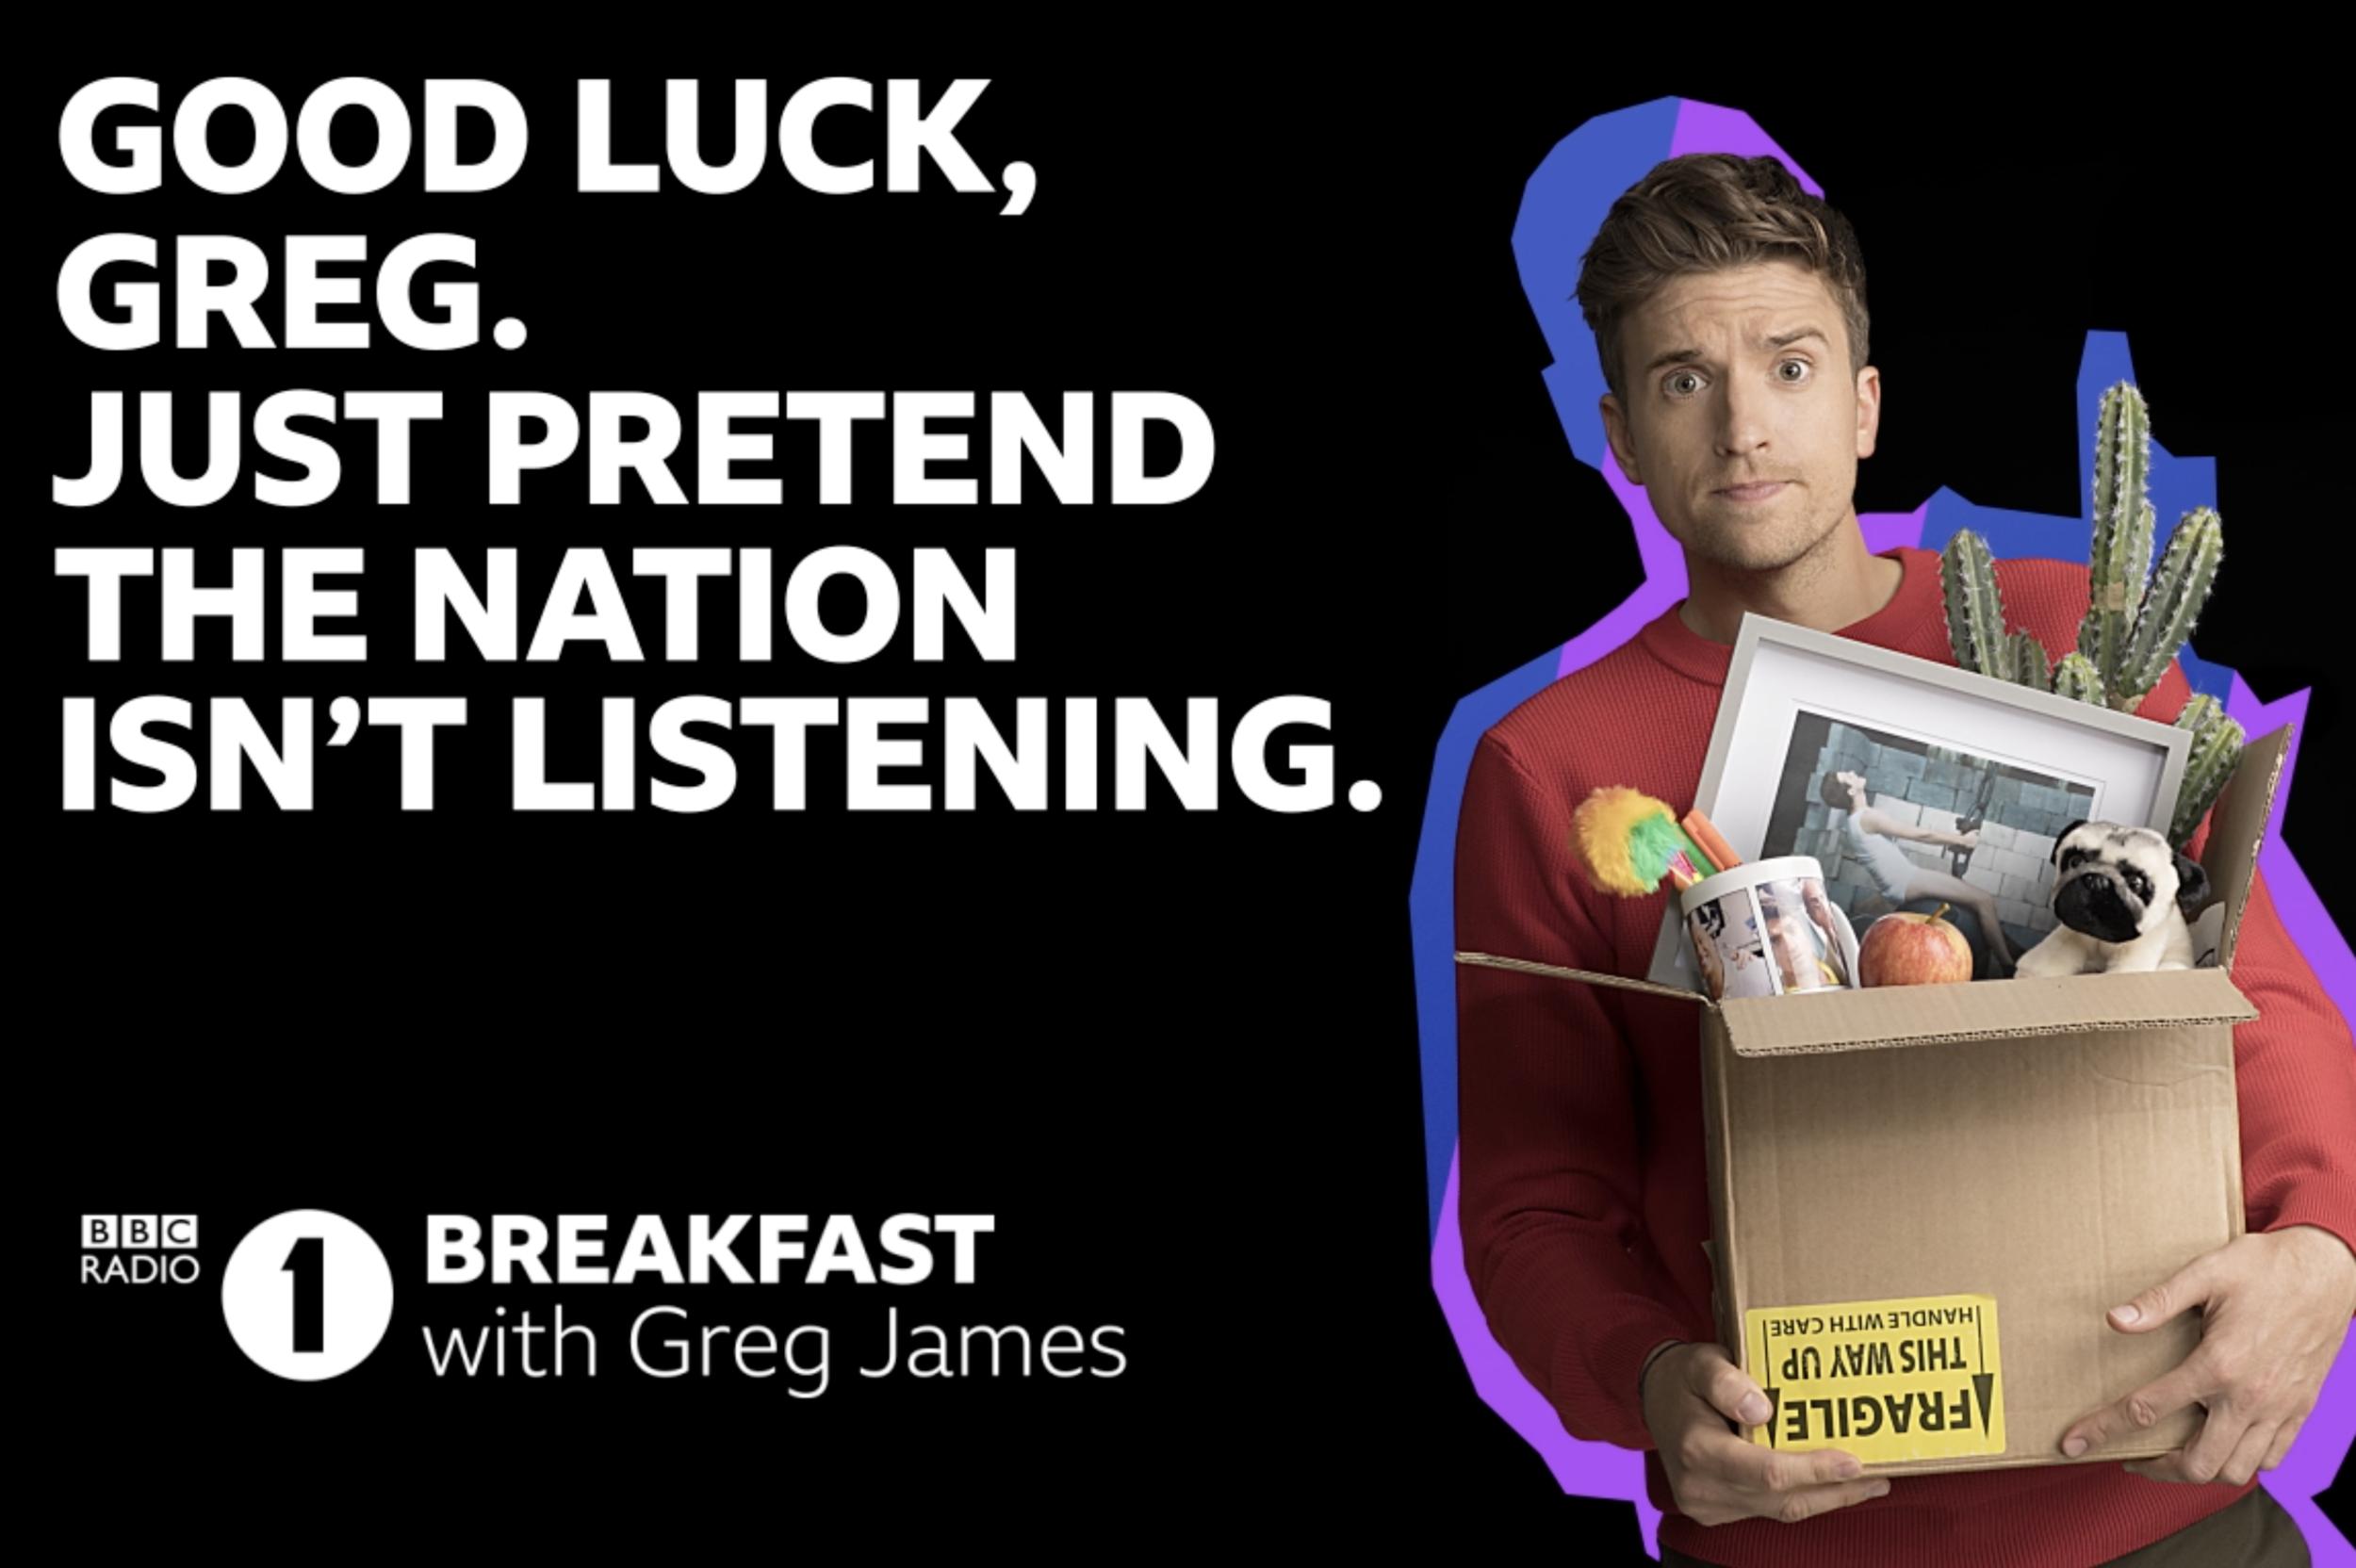 Don't Blow it Greg - Moving Billboard Key Art Campaign